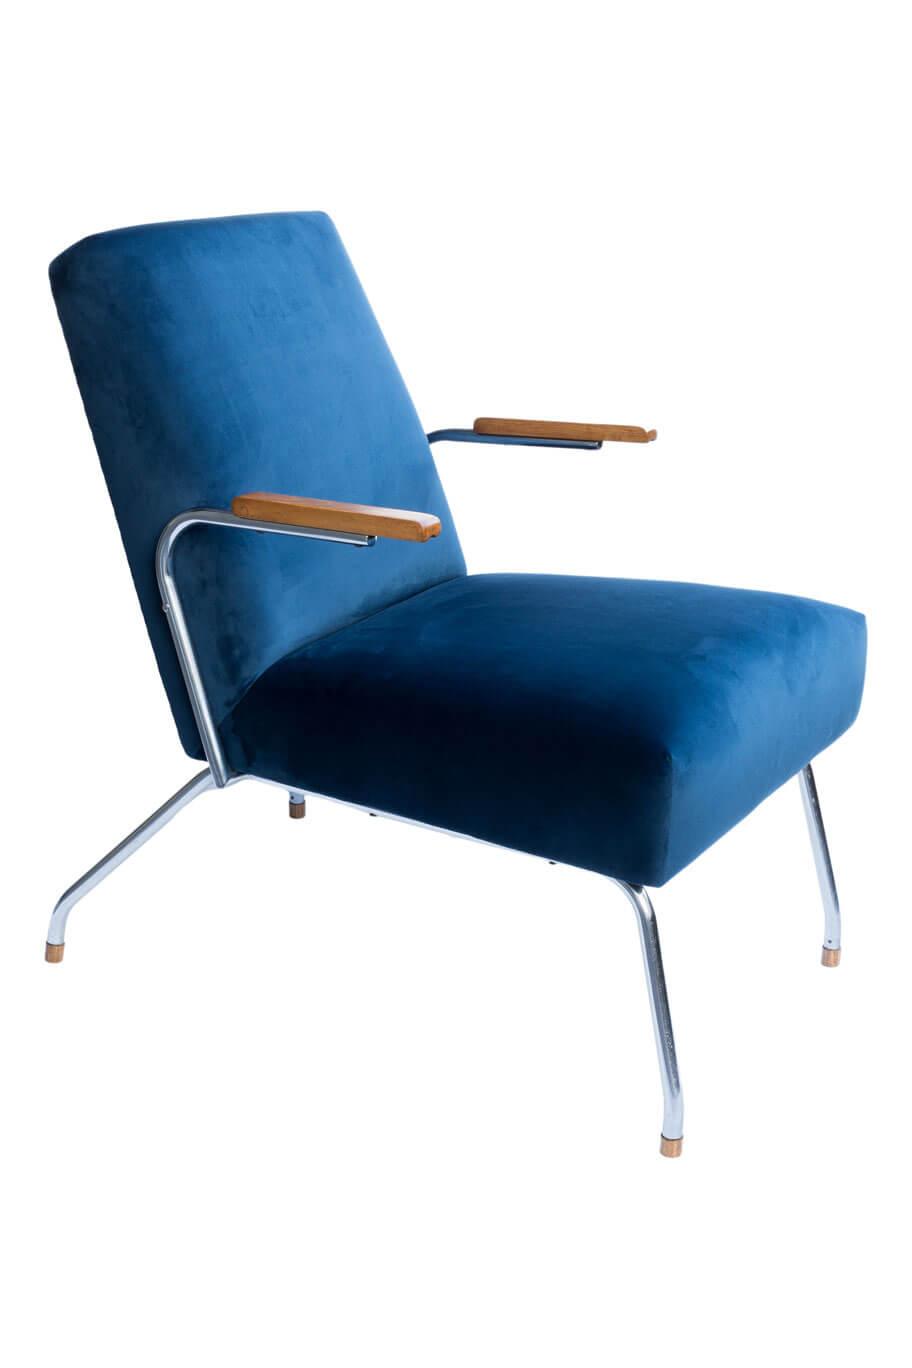 Bauhaus Armchair From Steel Furniture Factory In Zadziele Hemma